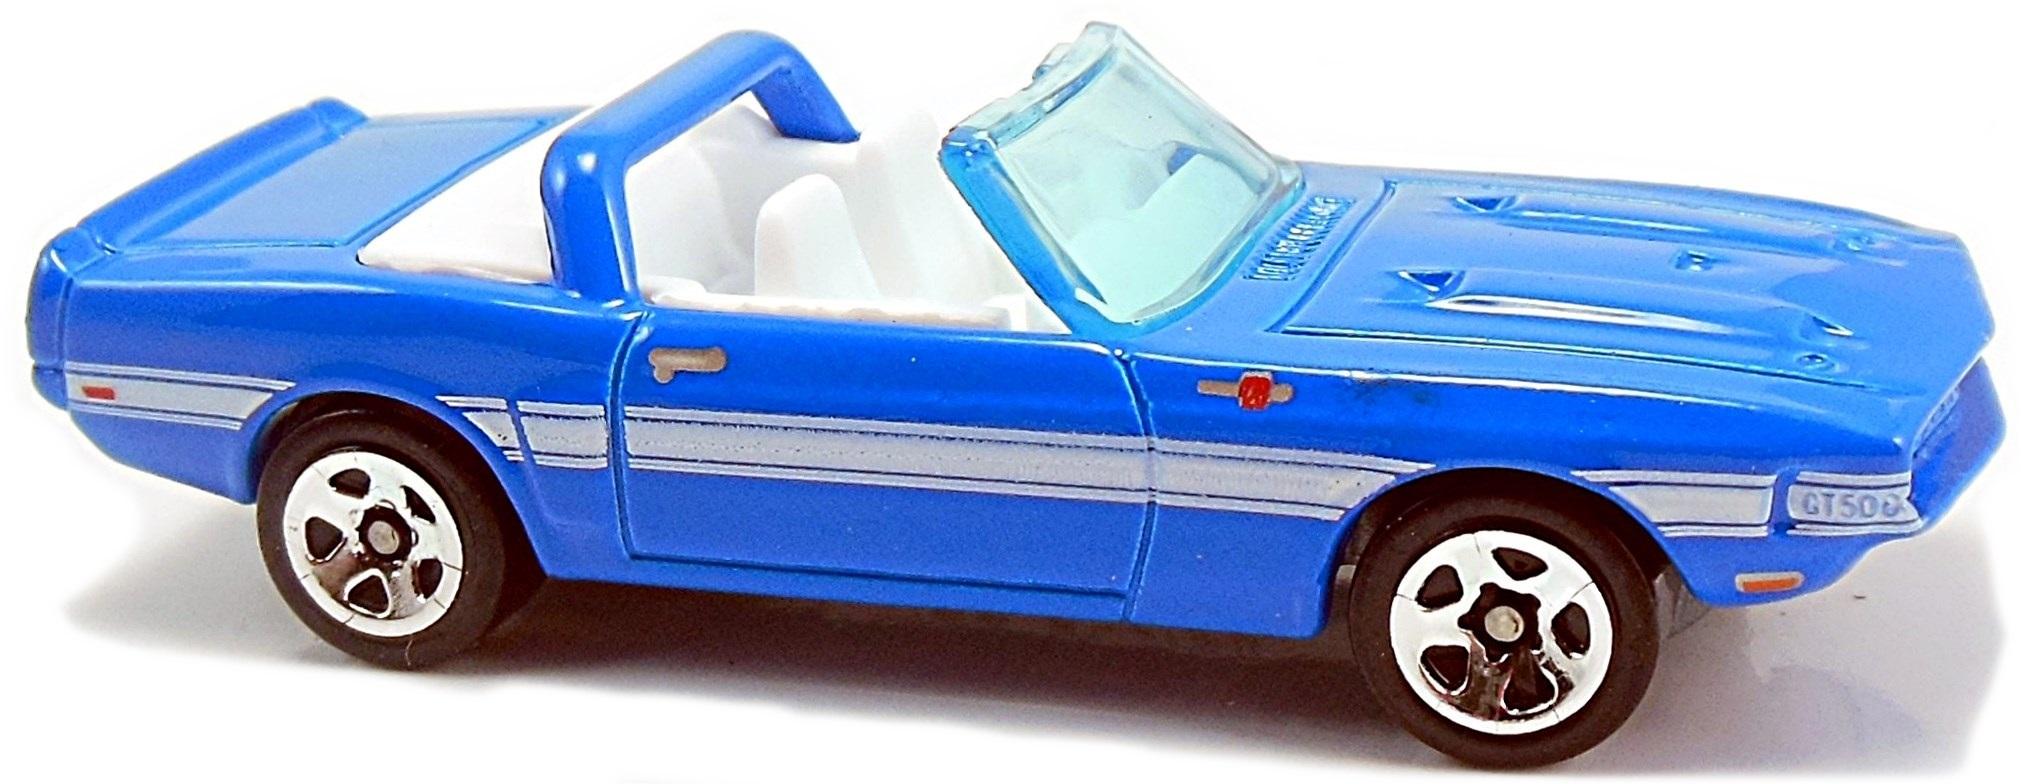 Hot Wheels 2011 21//244 Blue New Models 21//50-69 Shelby GT-500